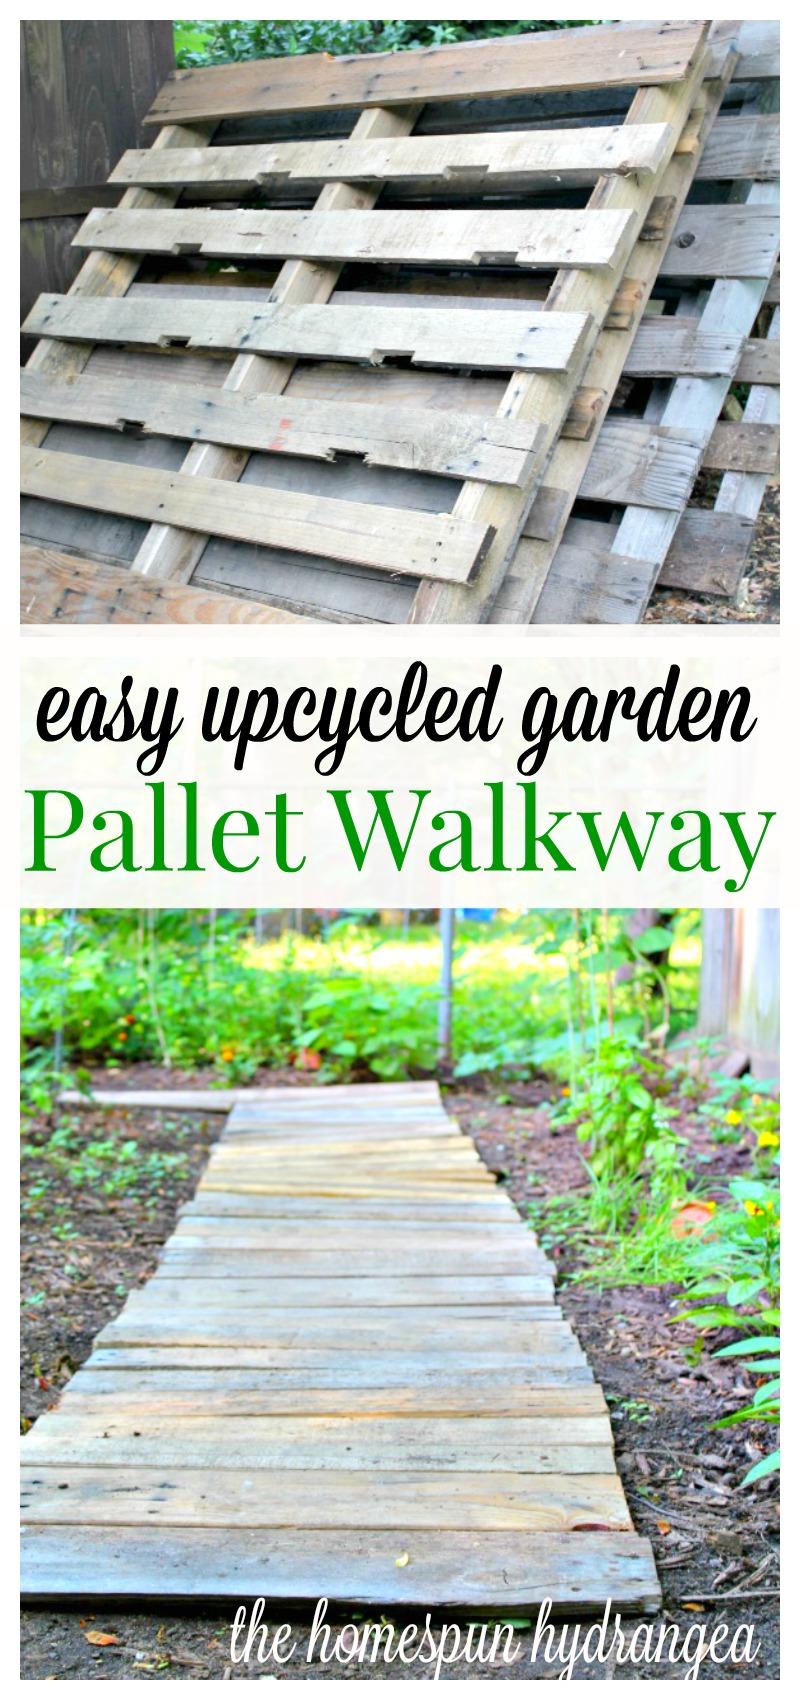 upcycled wood pallet walkway diy wood pallet walkway pallet walkway pallets garden. Black Bedroom Furniture Sets. Home Design Ideas